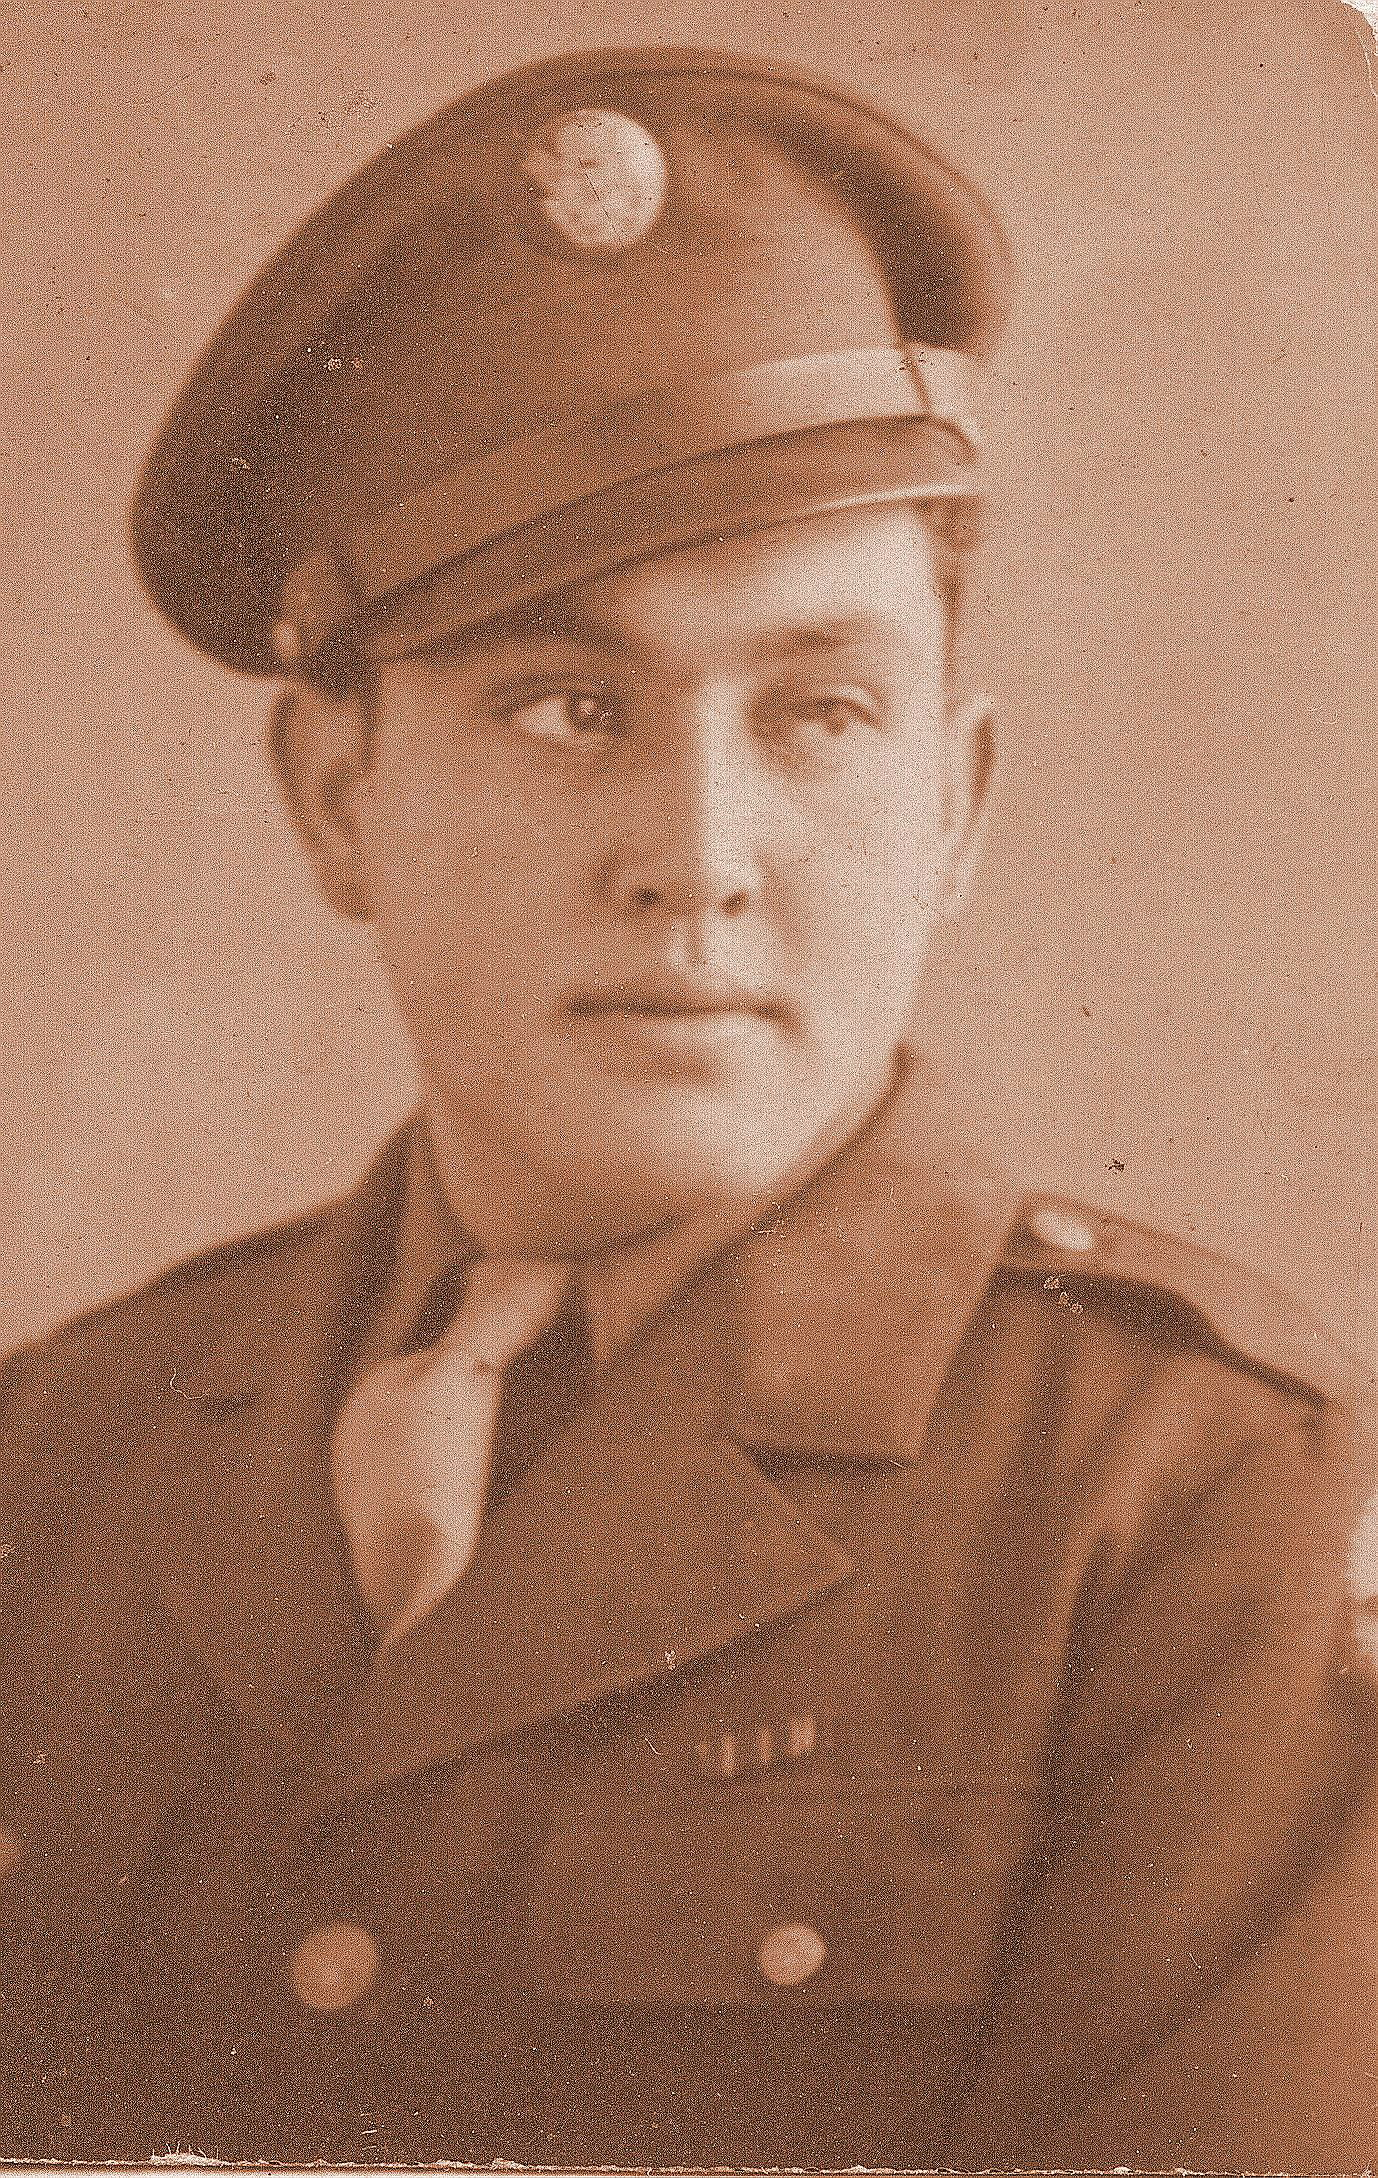 Eugenio Padilla